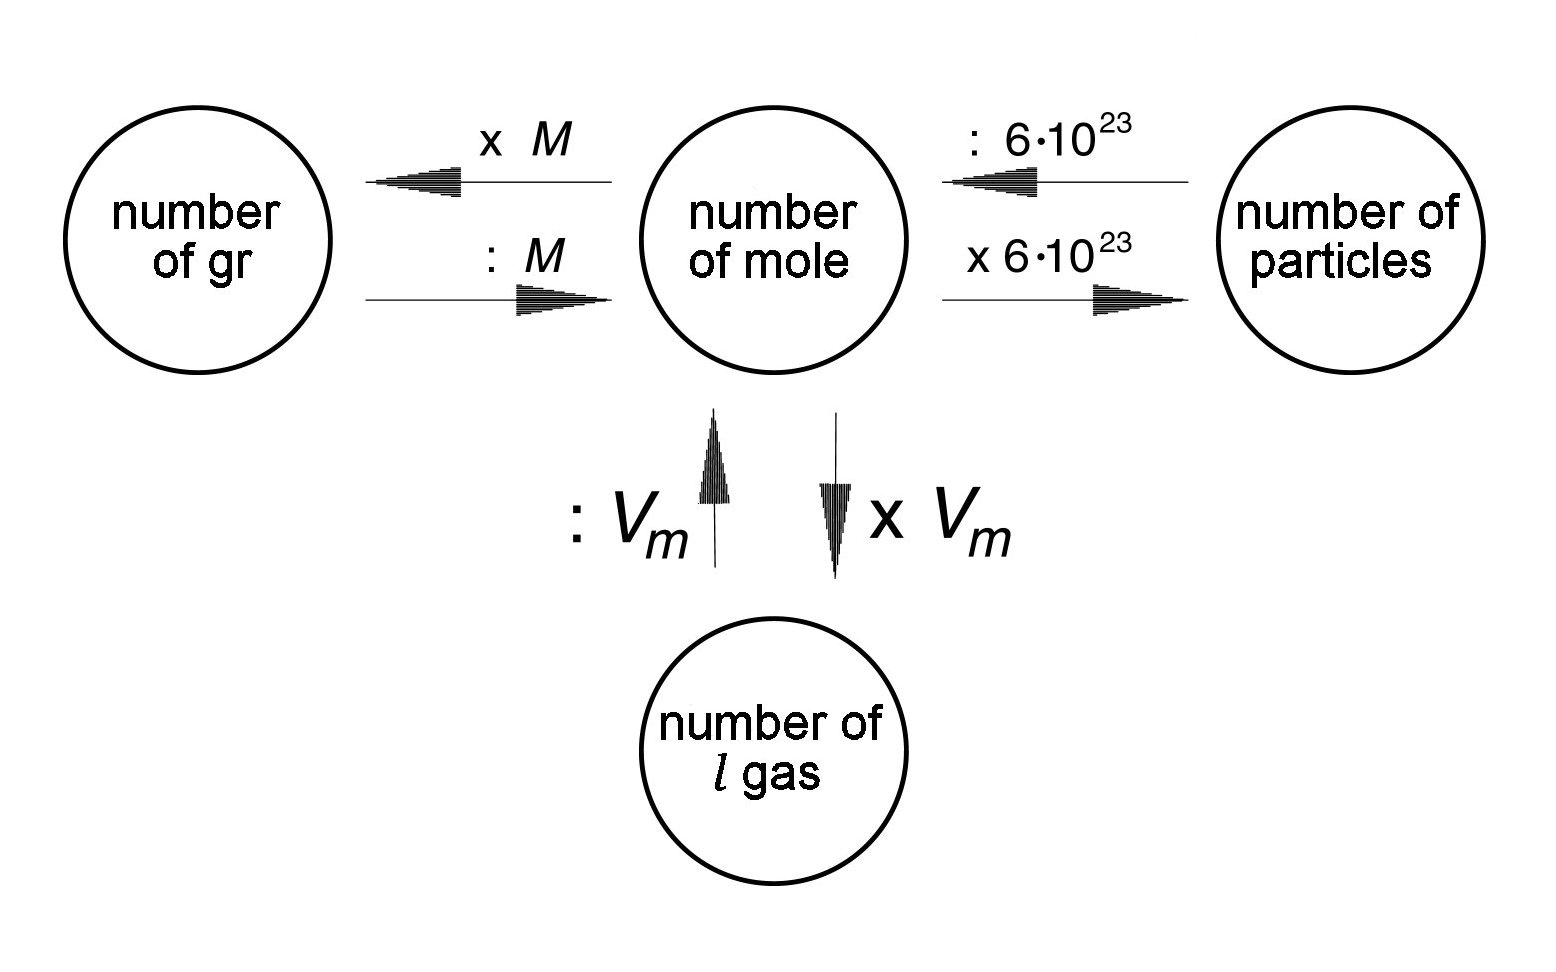 Basic concepts - Avogadro's scheme